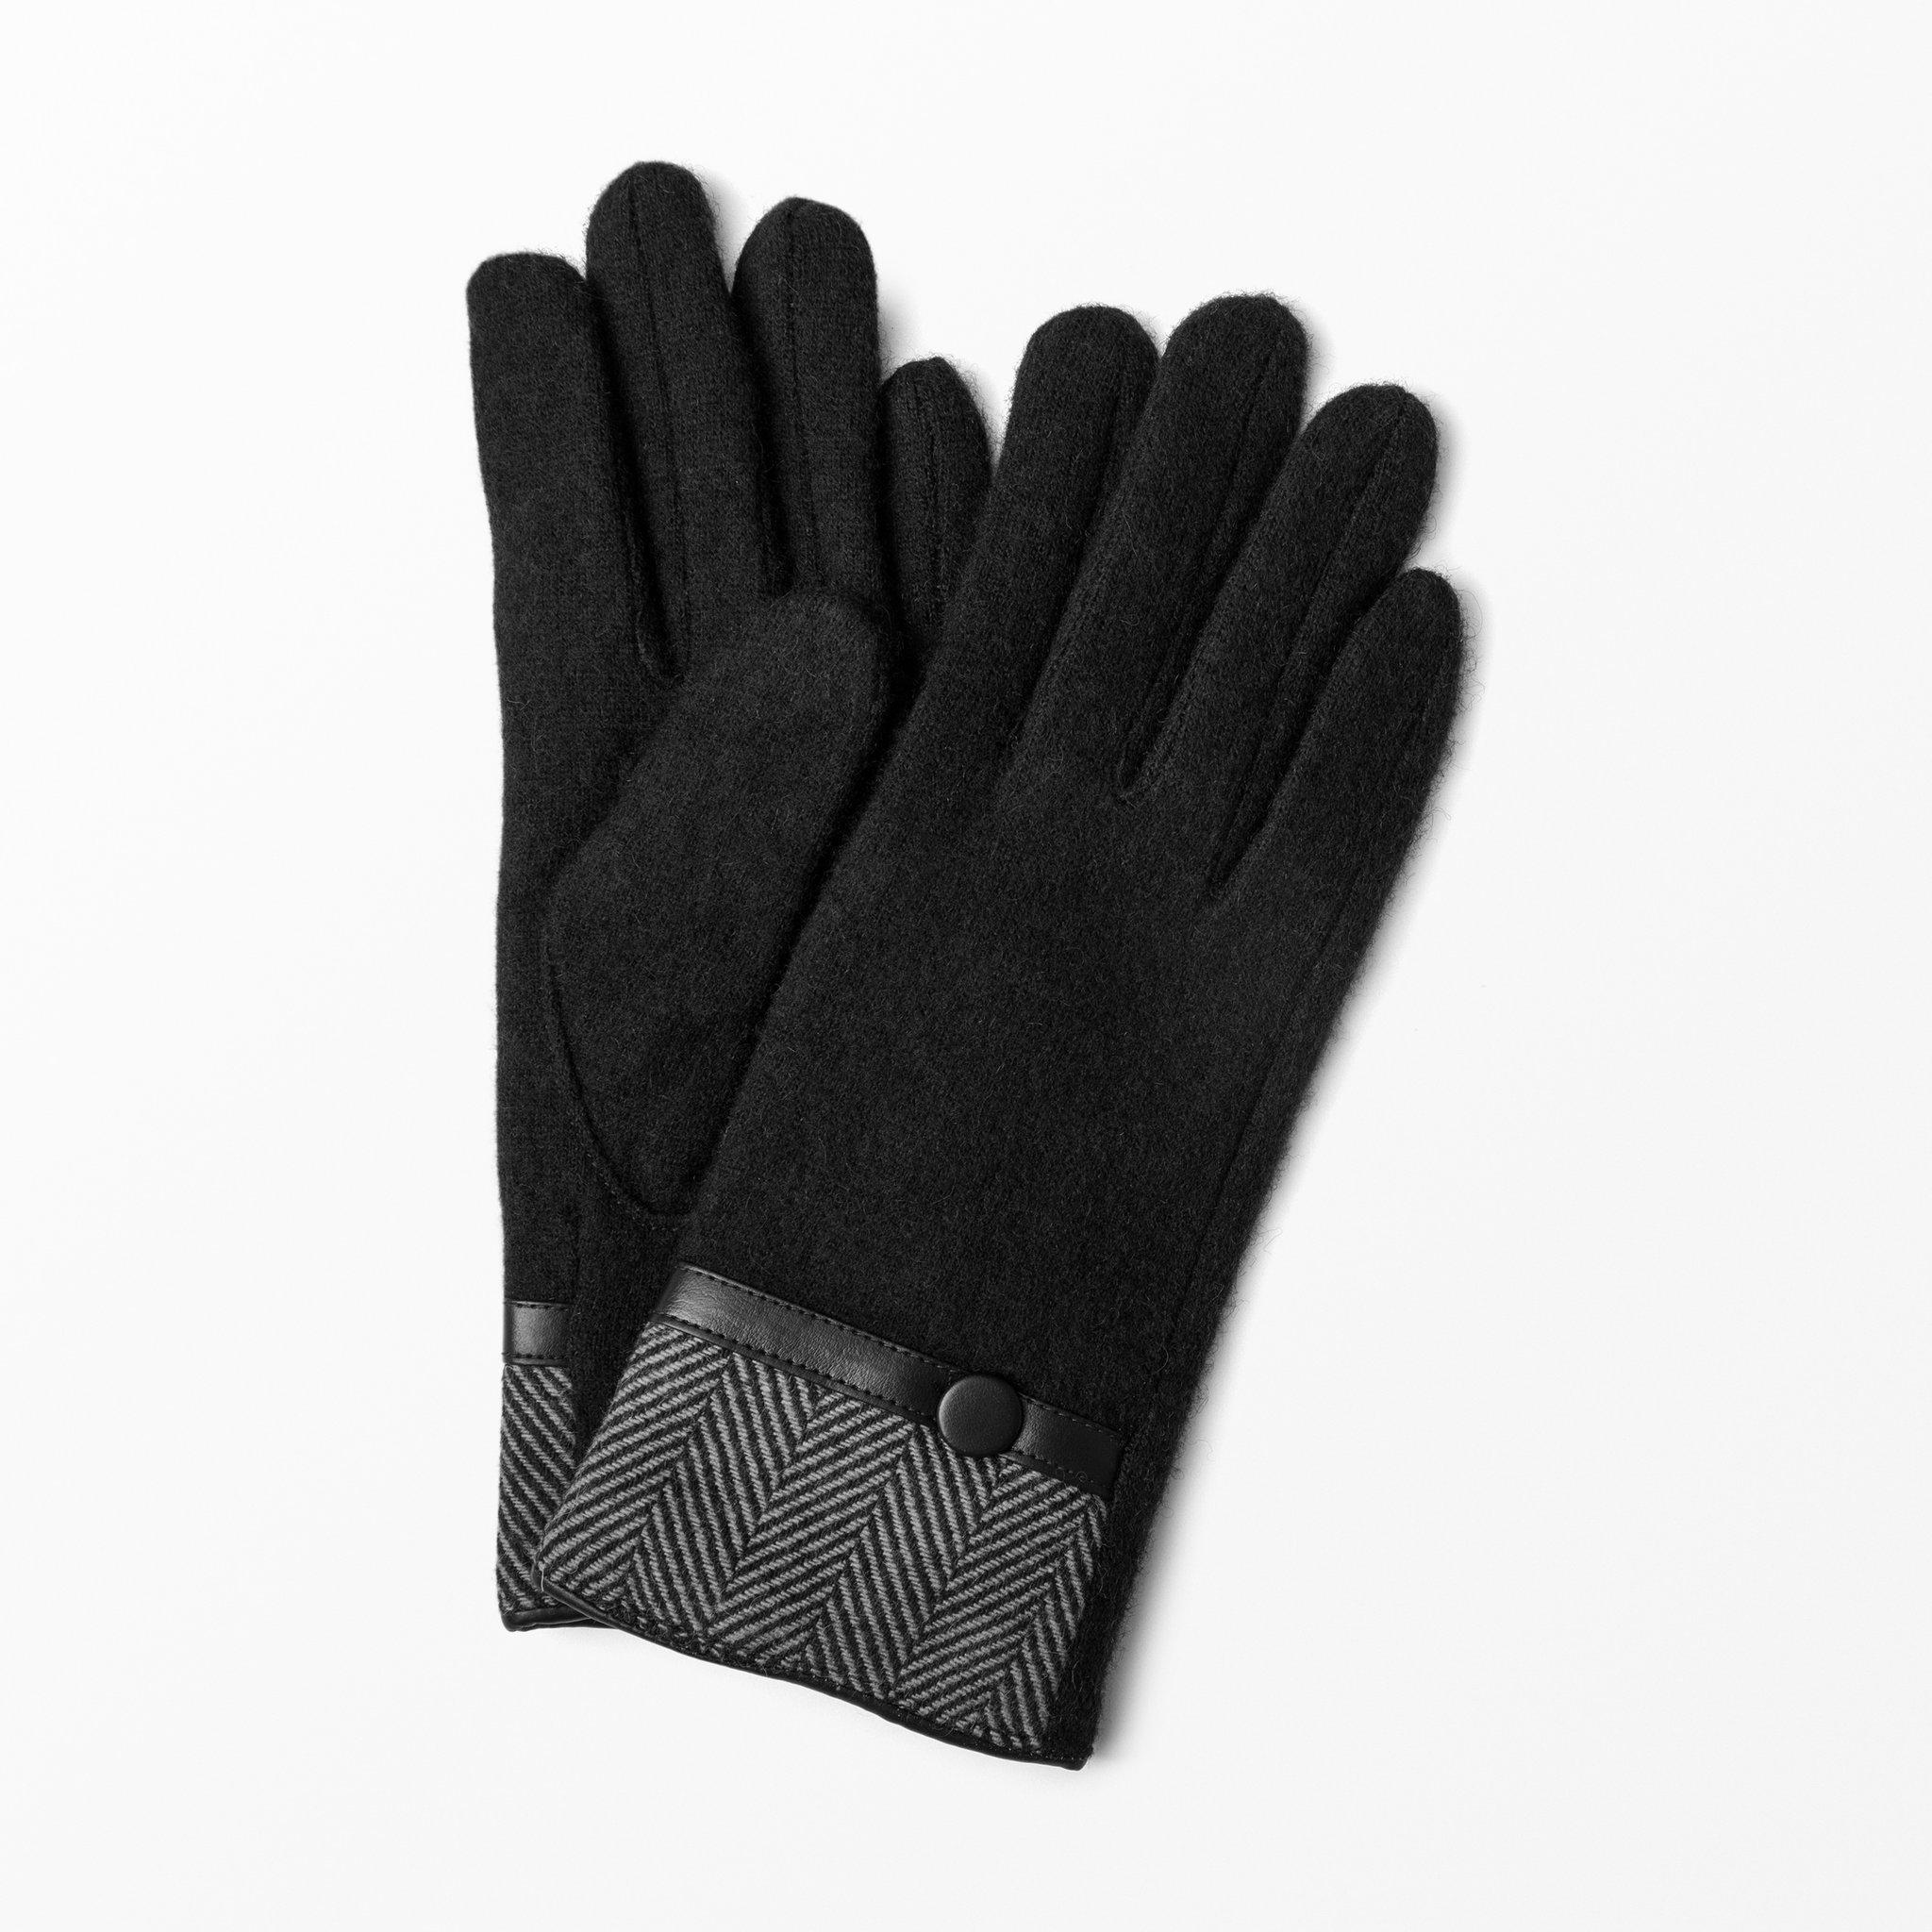 Handske i ull